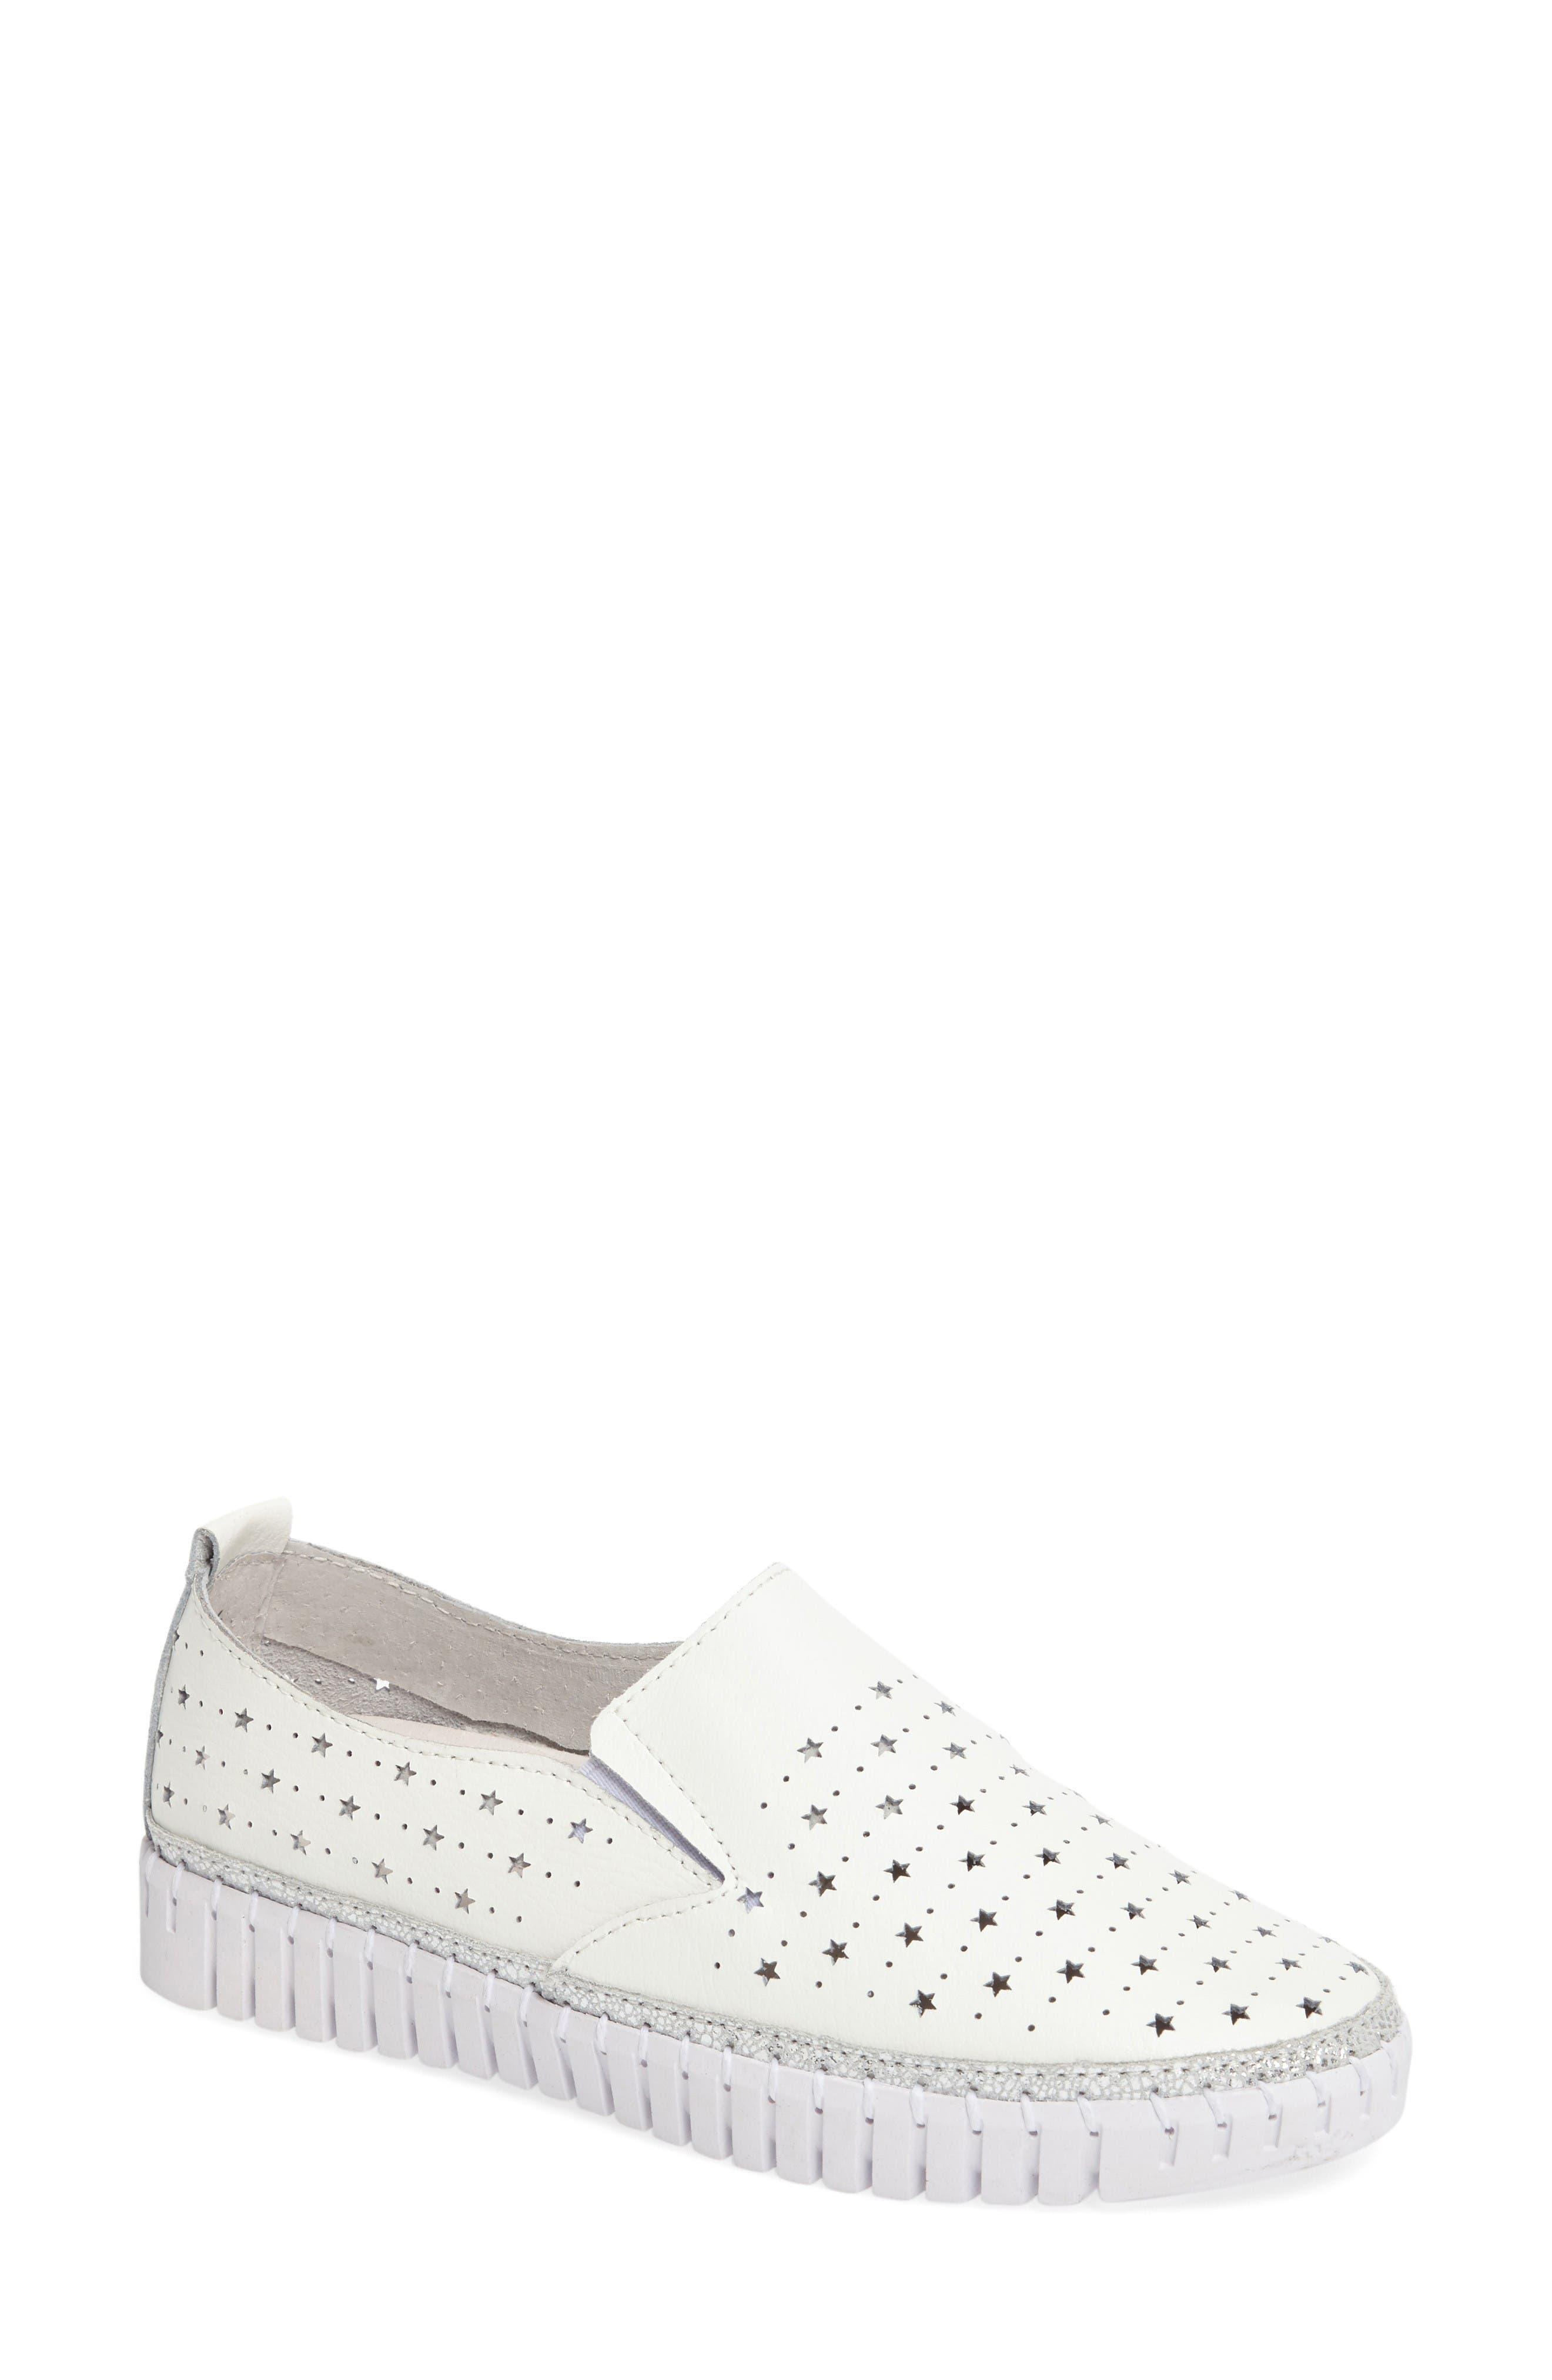 BERNIE MEV. TW40 Slip-On Sneaker